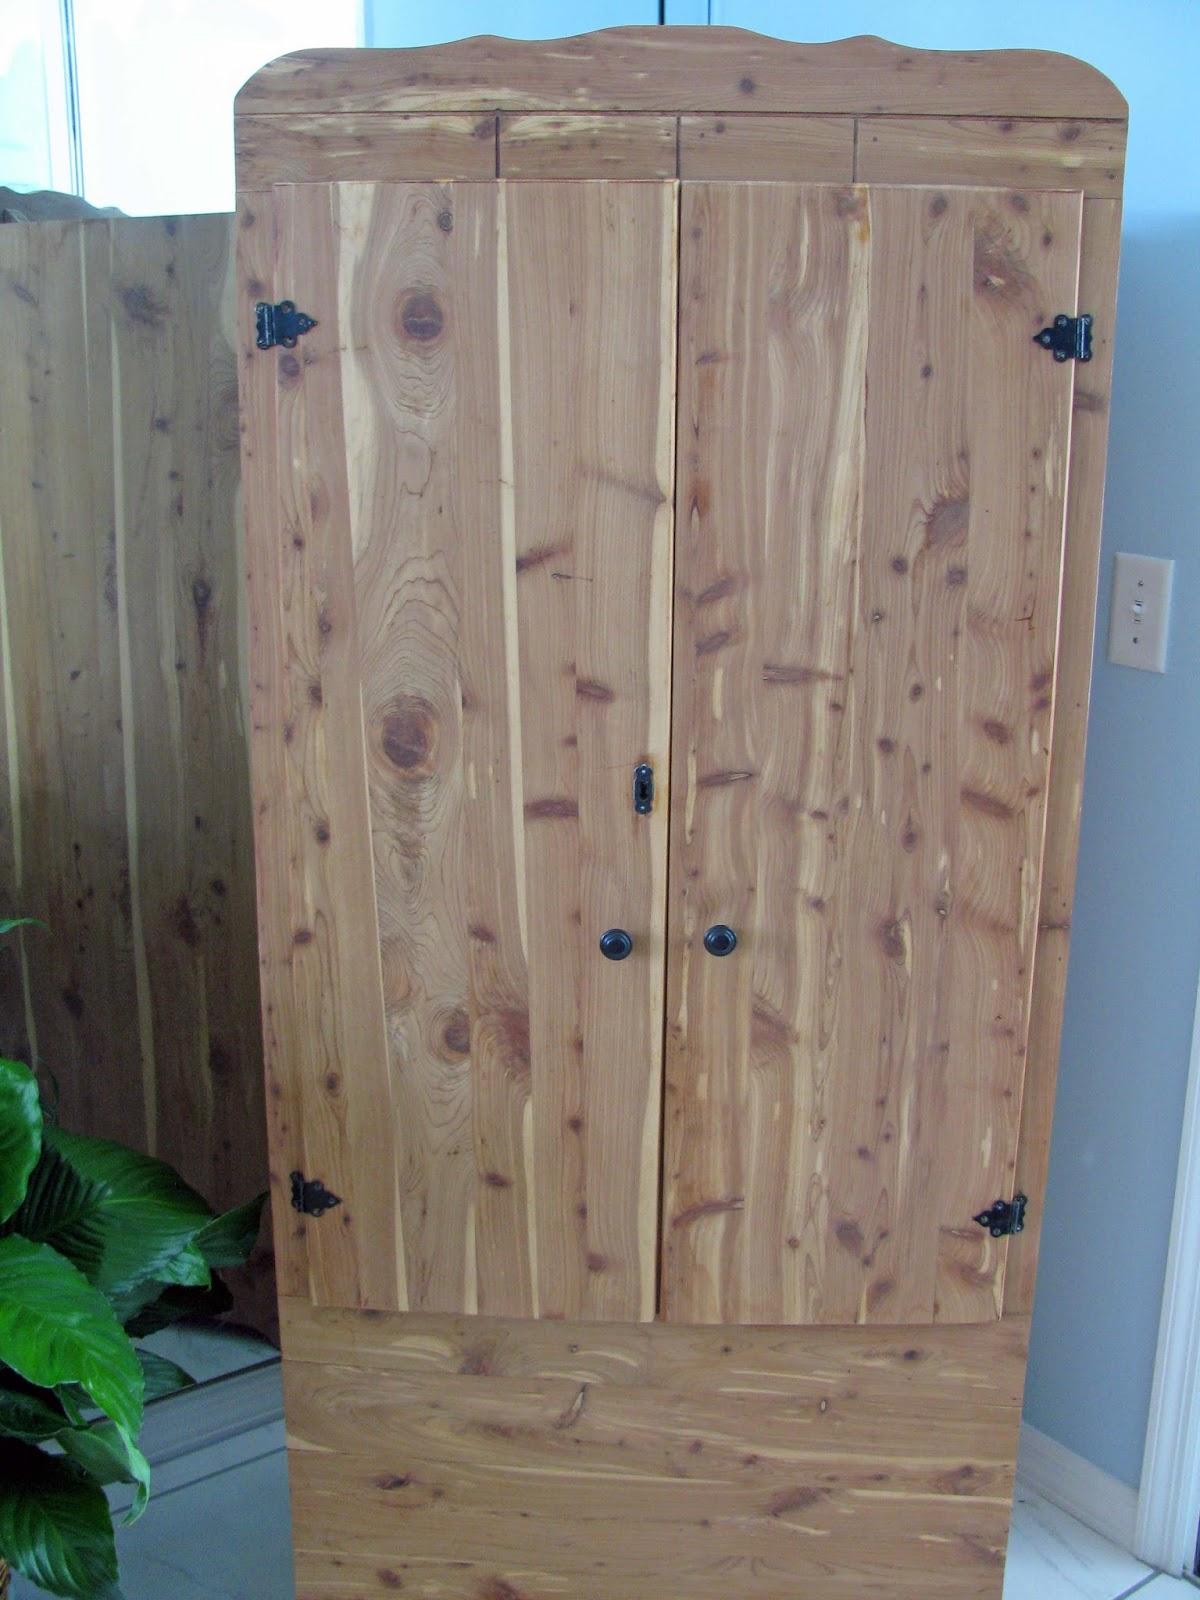 Cedar Closets 3 Nails 4 U Construction: Slammin' The Screen Door: My New Old Cedar Closet And Slow